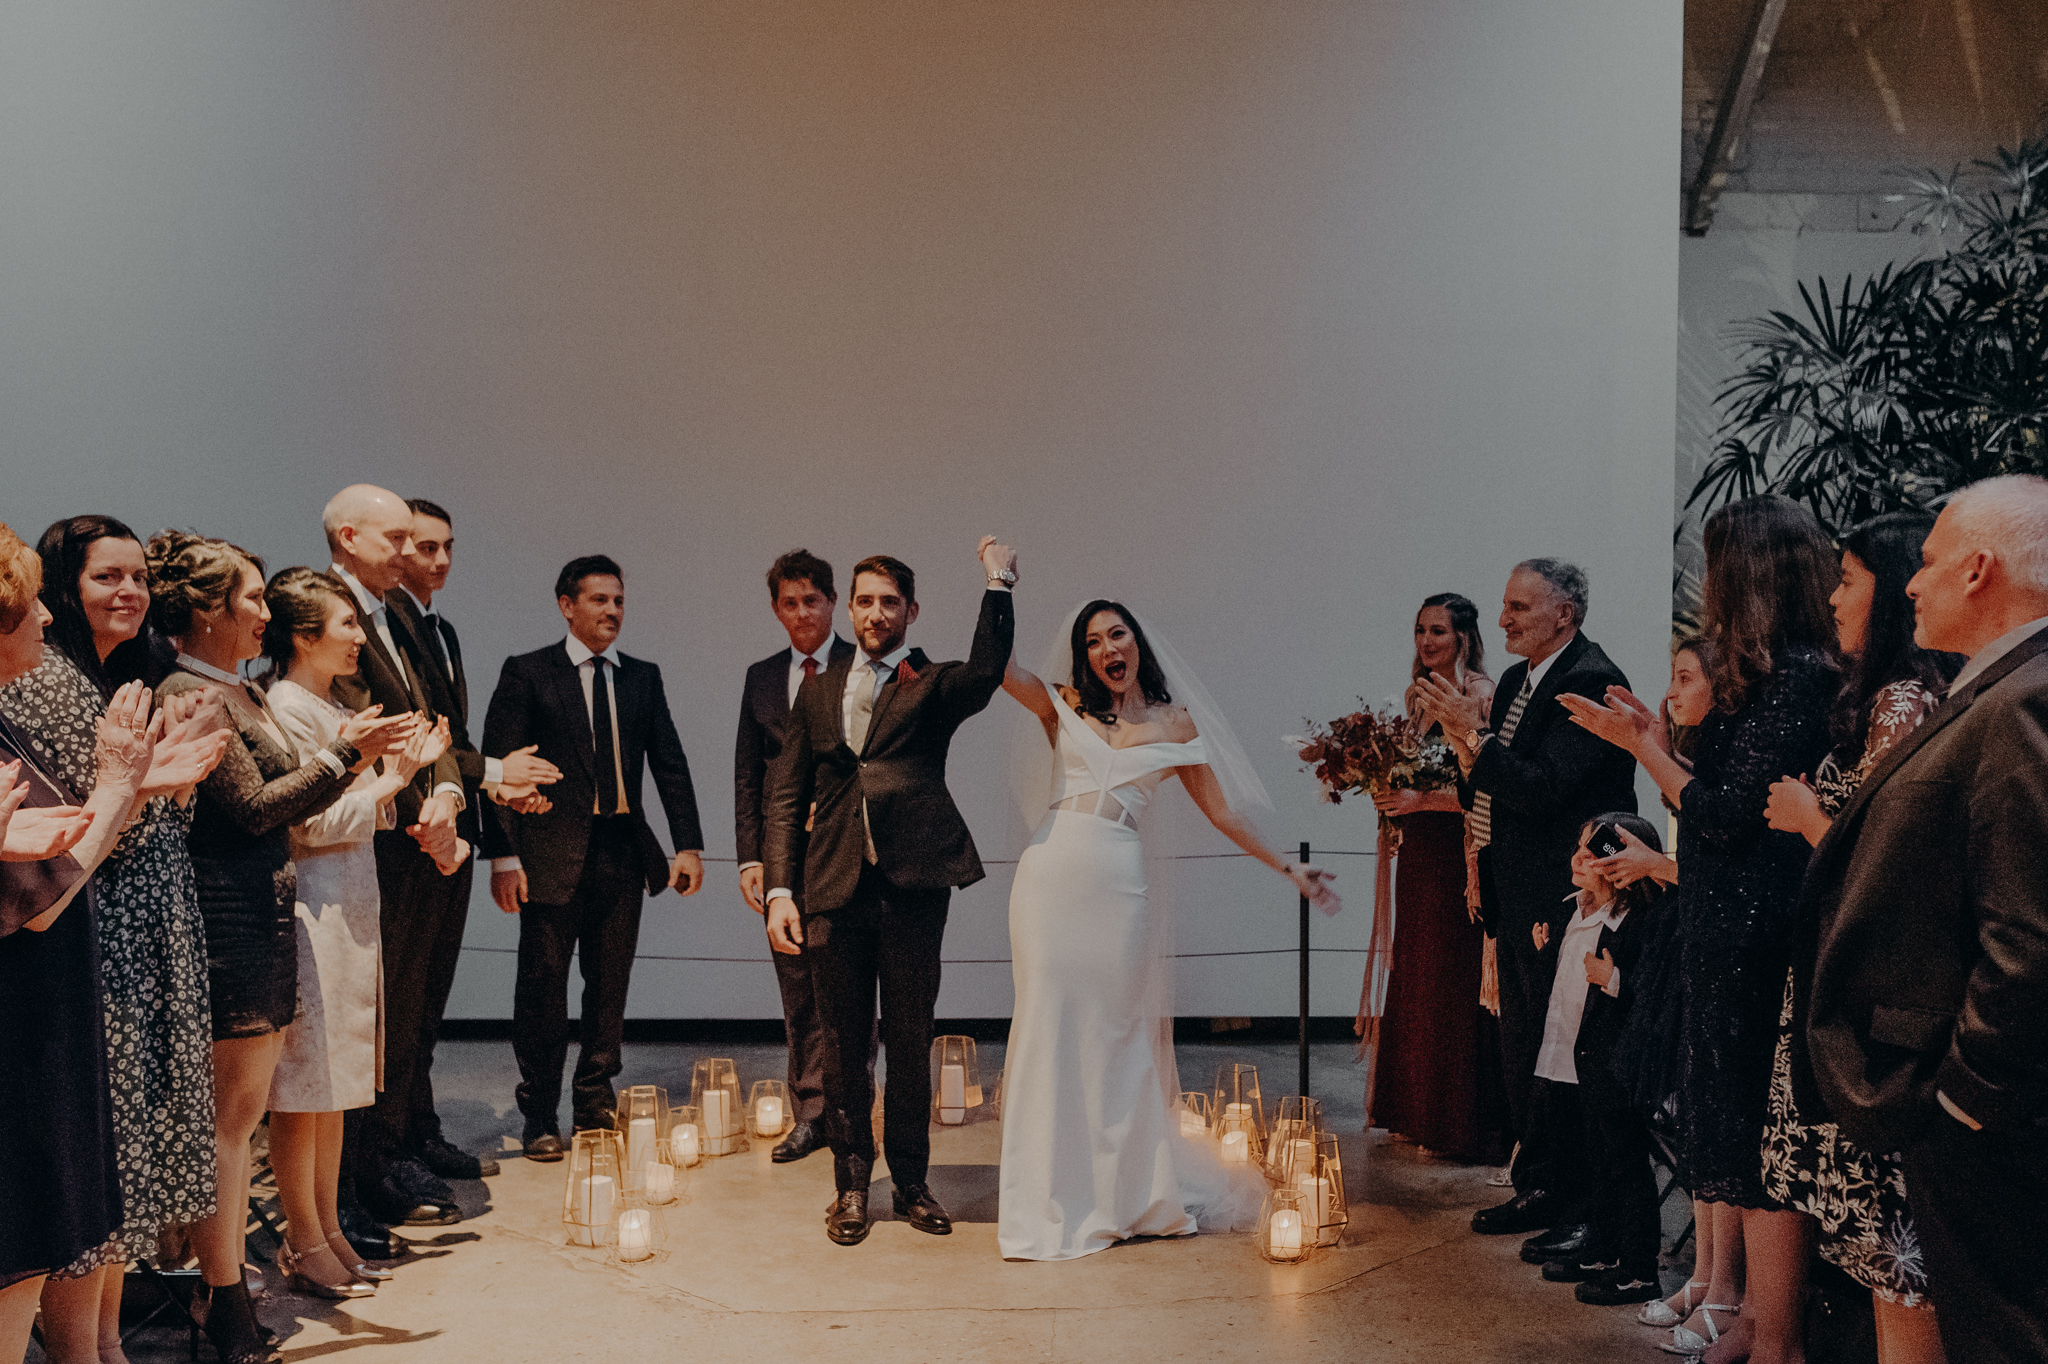 Wedding Photo LA - wedding photographer in los angeles - millwick wedding venue -isaiahandtaylor.com-101.jpg